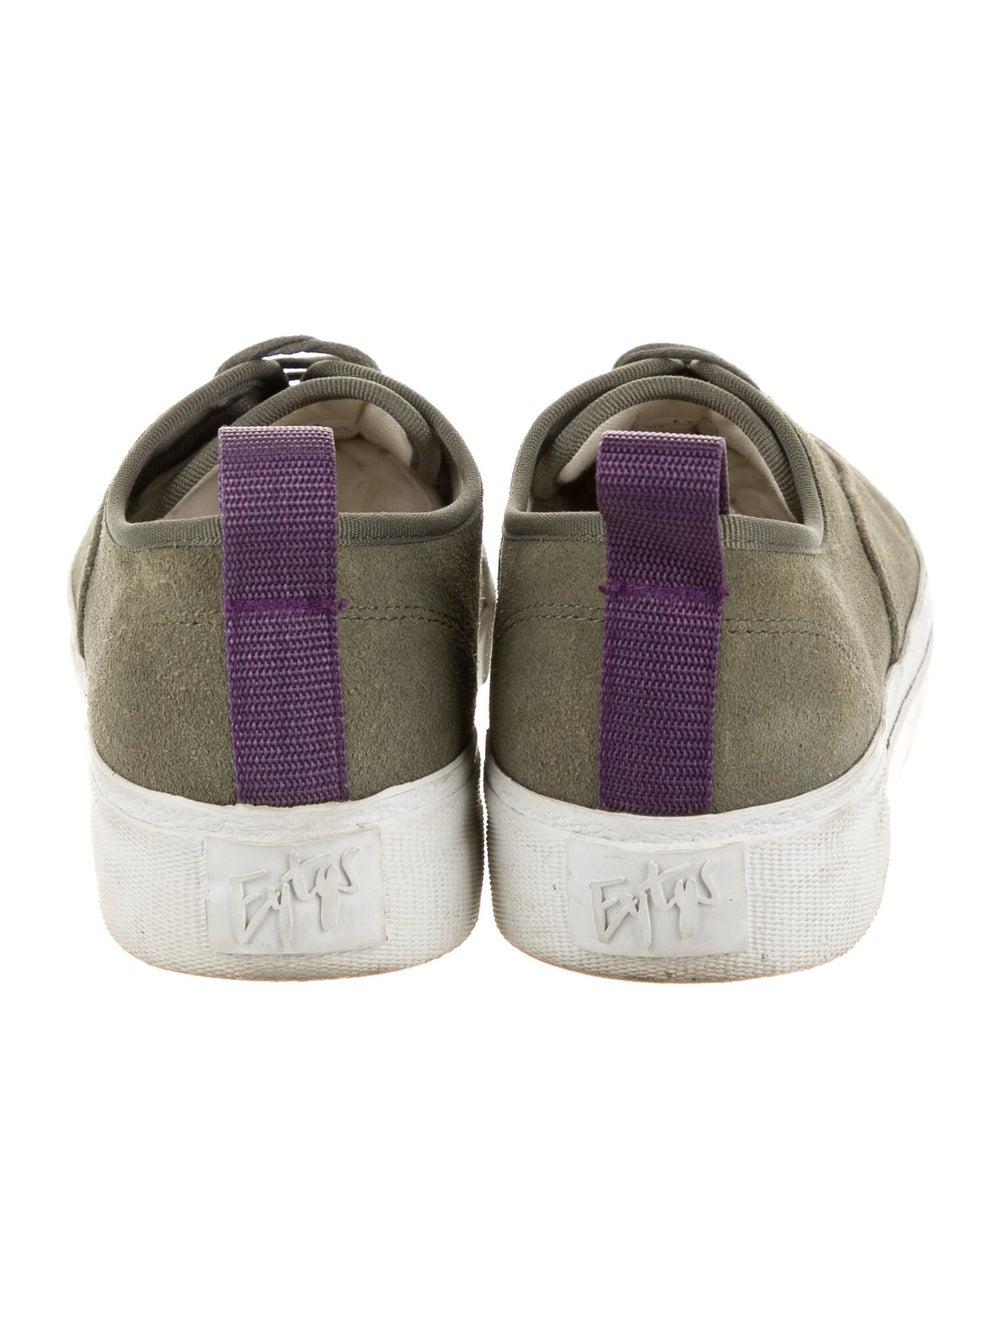 Eytys Suede Sneakers Green - image 4